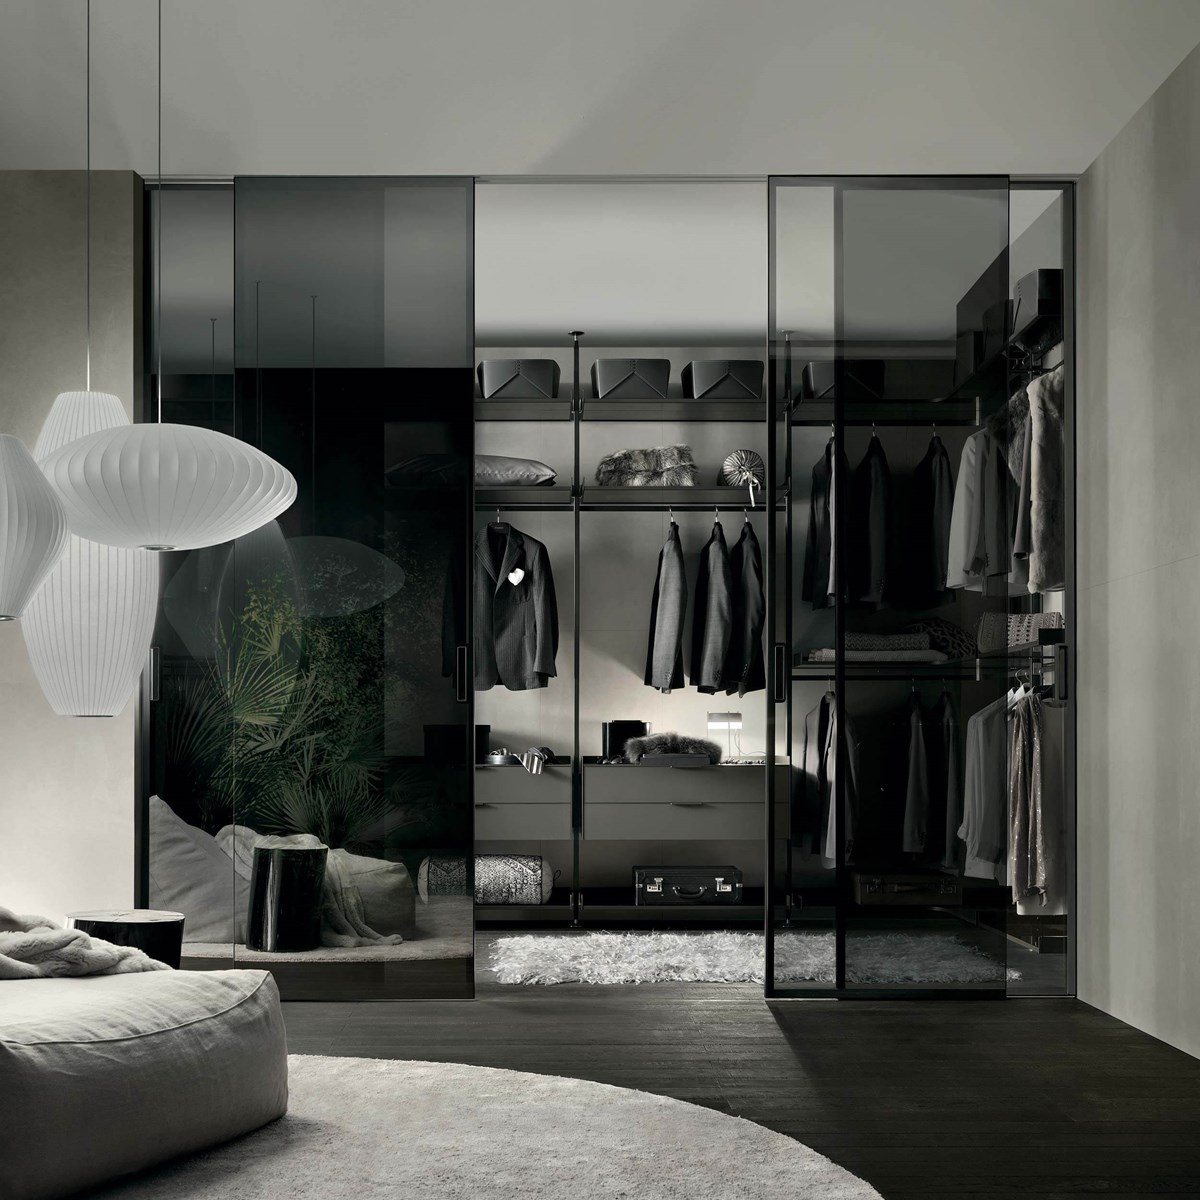 Rimadesio-Giuseppe-Bavuso-Graphis-Light-Sliding-Door-Matisse-1